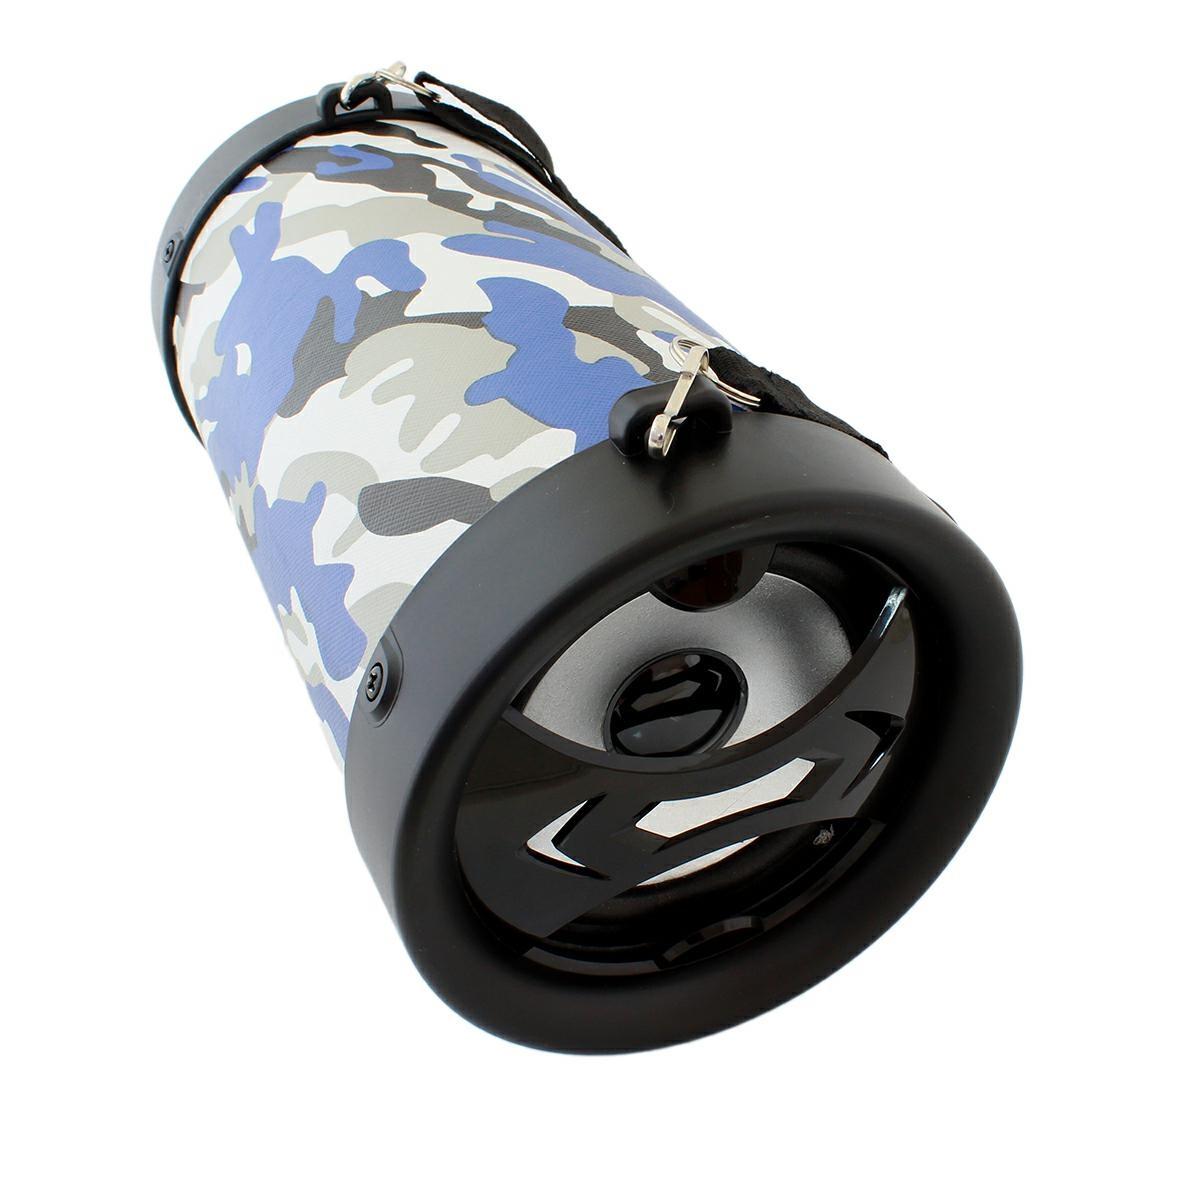 APT ZS47C Reproduktor BOOMBOX Bluetooth MP3 Tuba maskáč